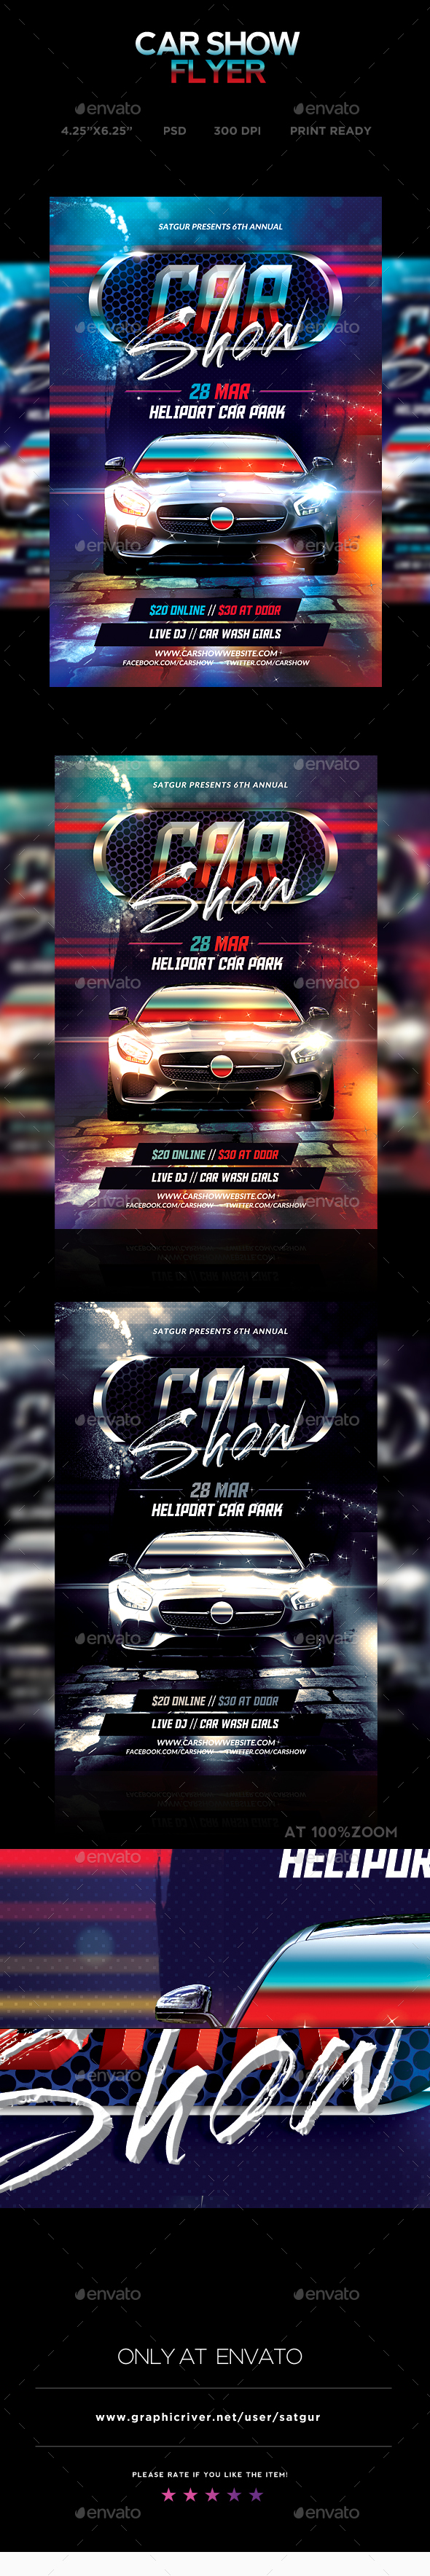 Car Show Flyer - Street - Miscellaneous Events